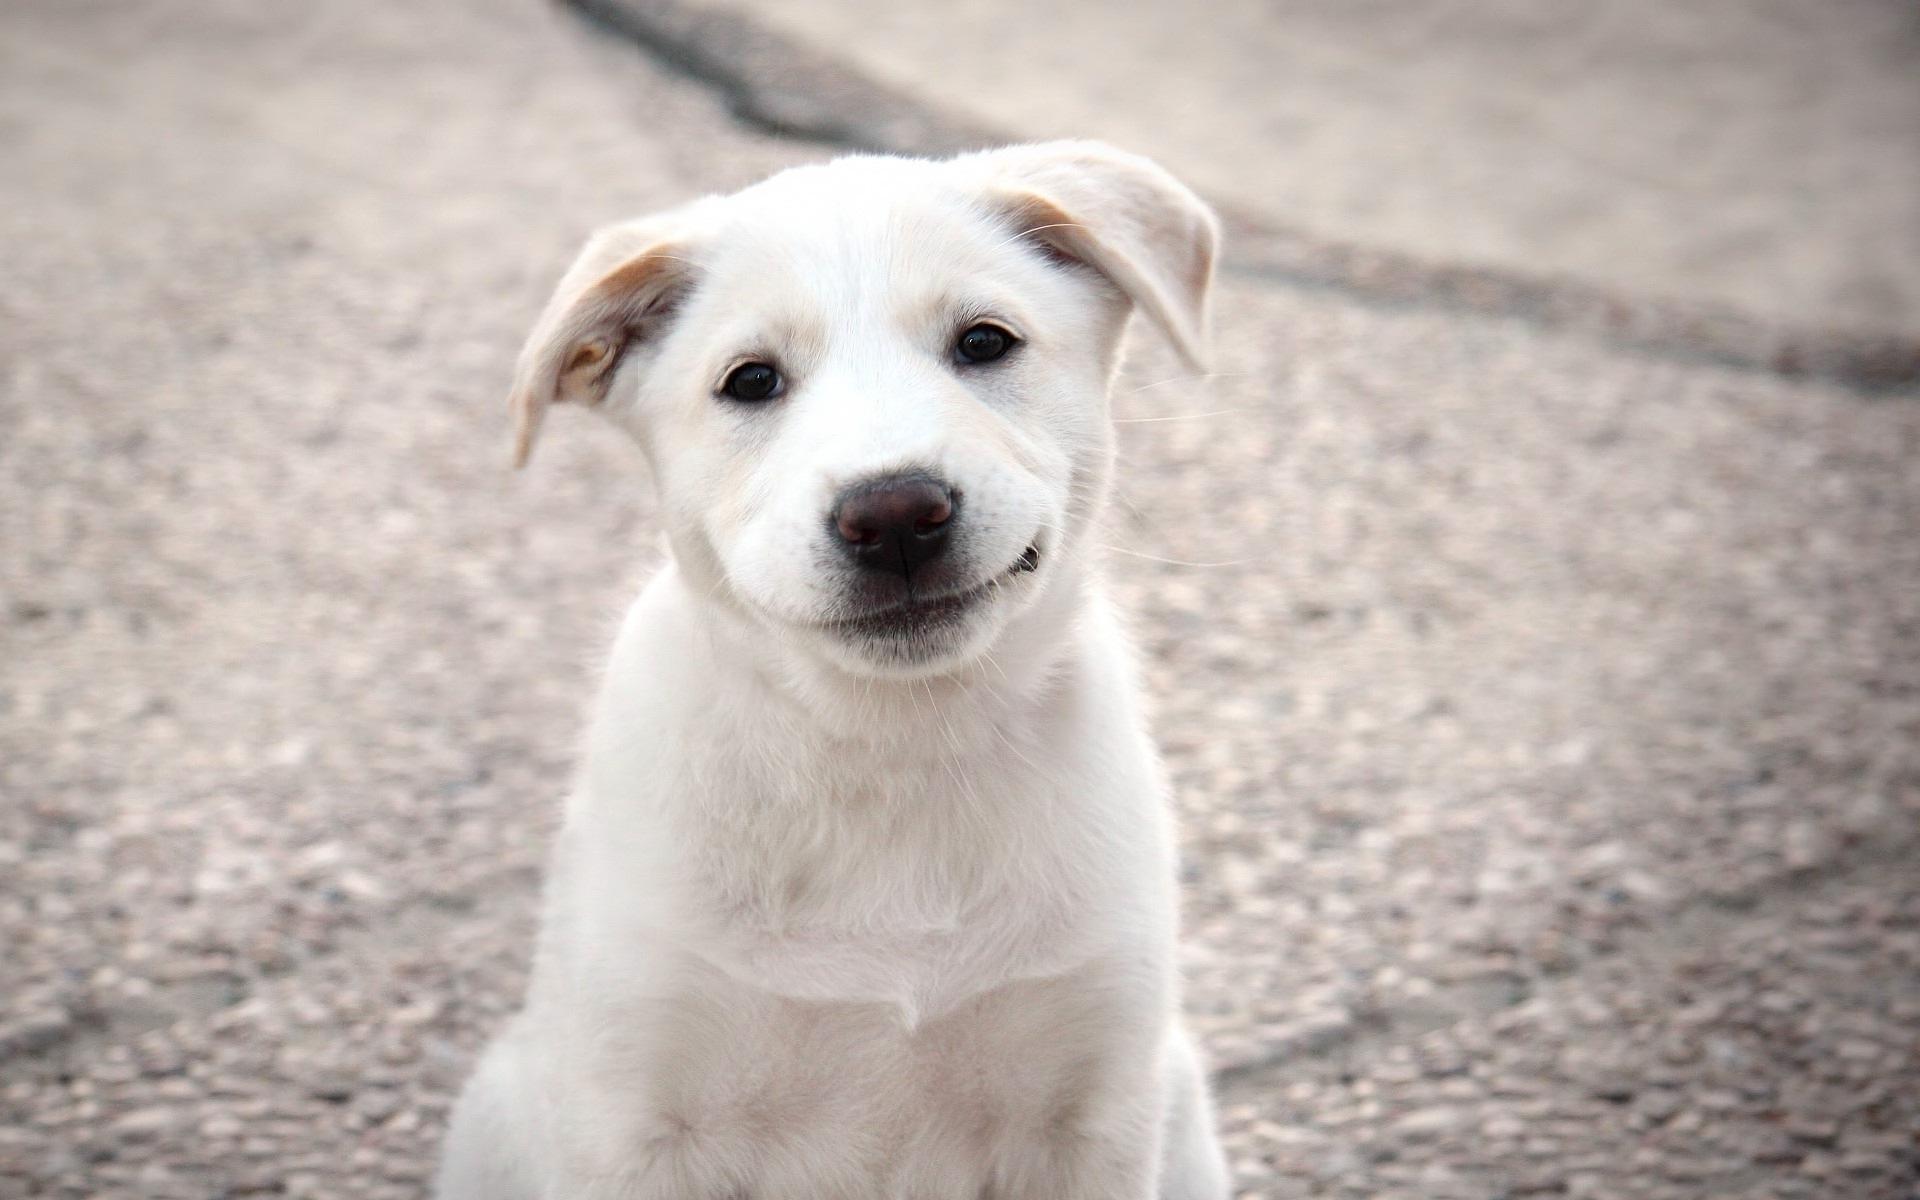 понятно, добрый пес картинки мен парвах олна